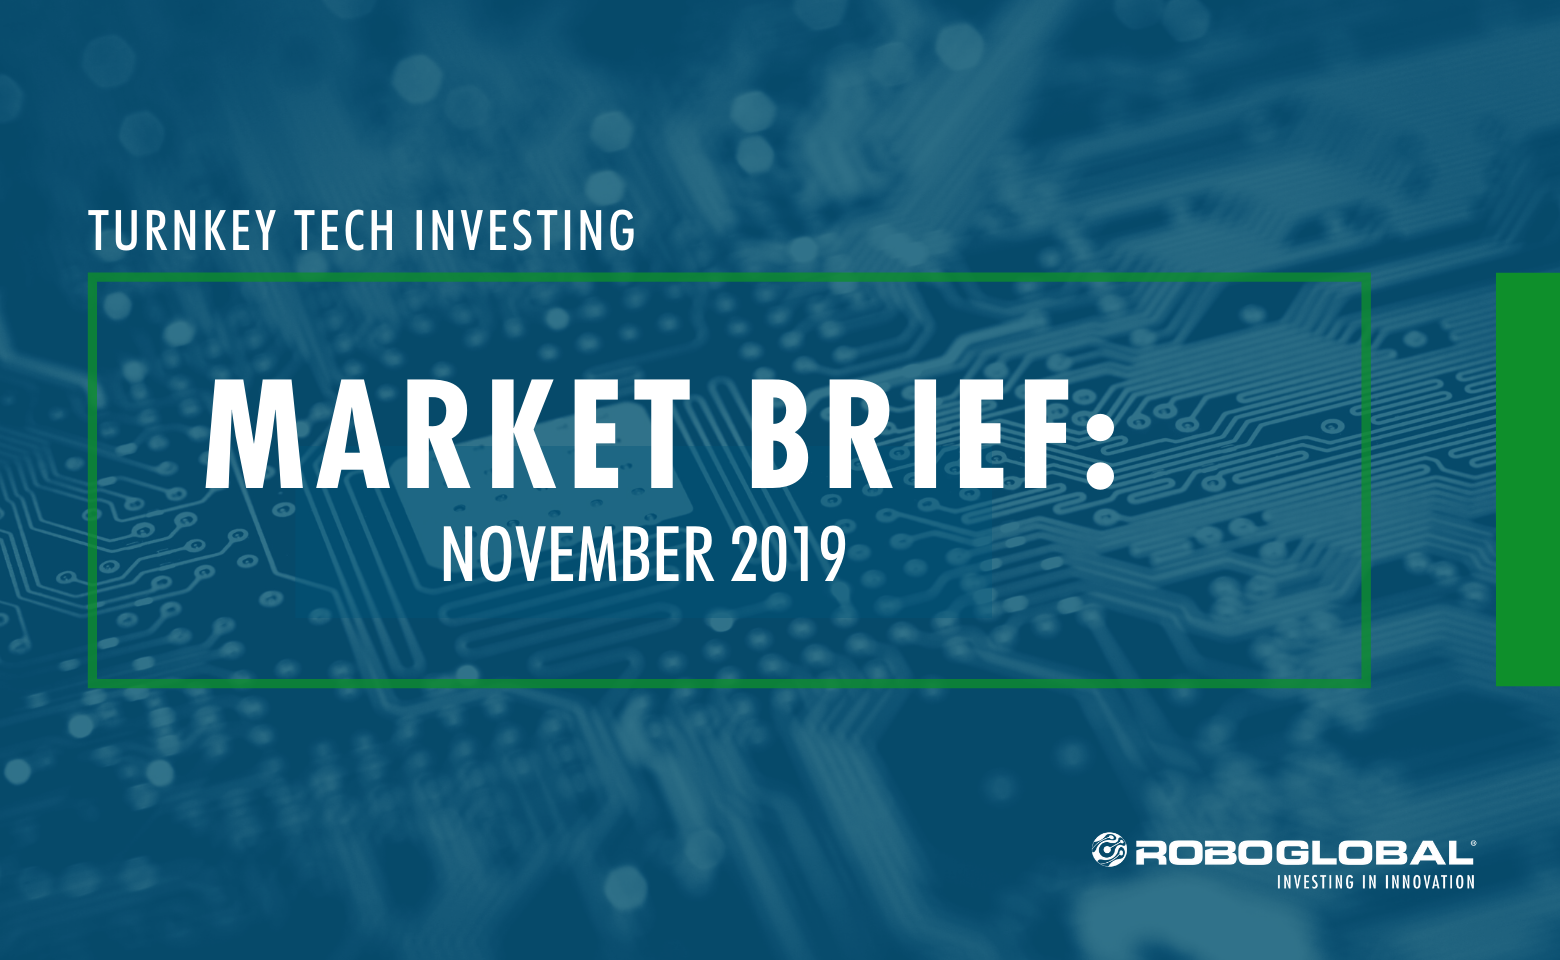 Turnkey Tech Investing: November 2019 Market Brief